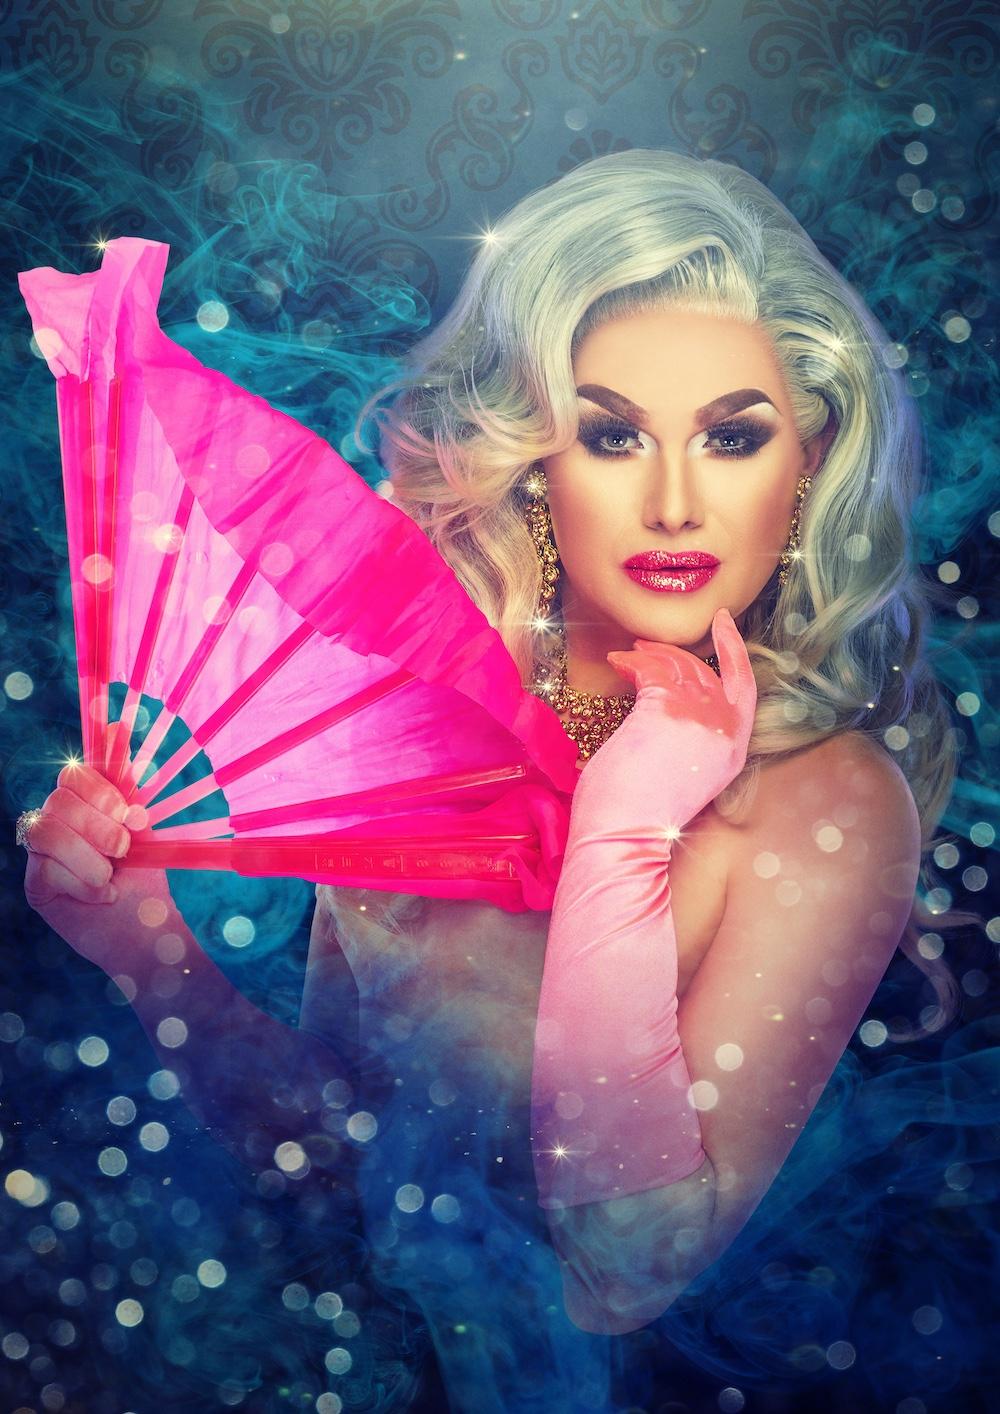 arq-masqueerade-charisma-belle-sydney-drag-queen.jpg